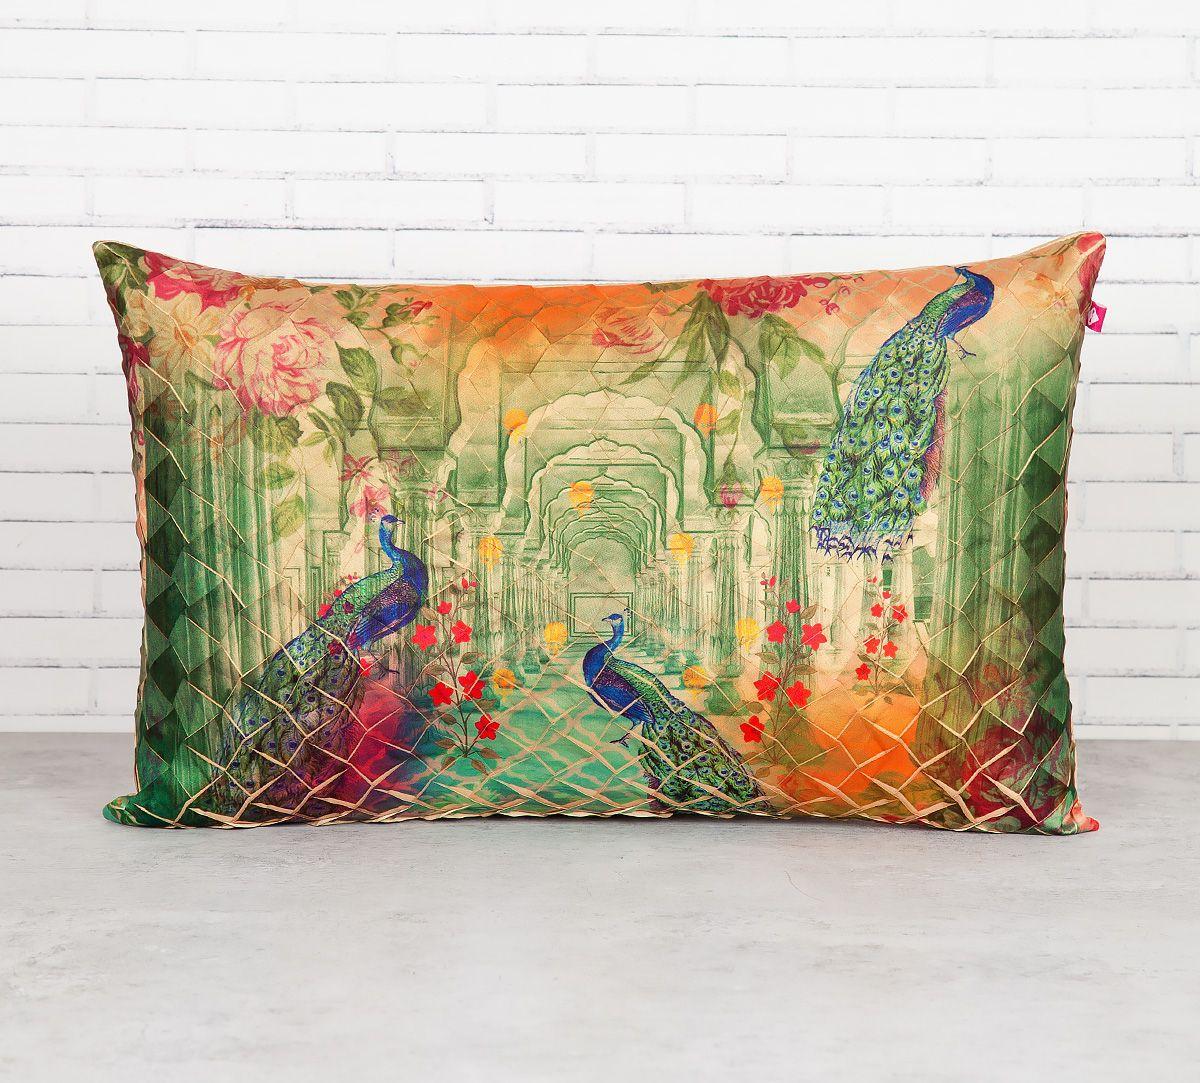 India Circus Peacock Dwar Decorative Scale Cushion Cover